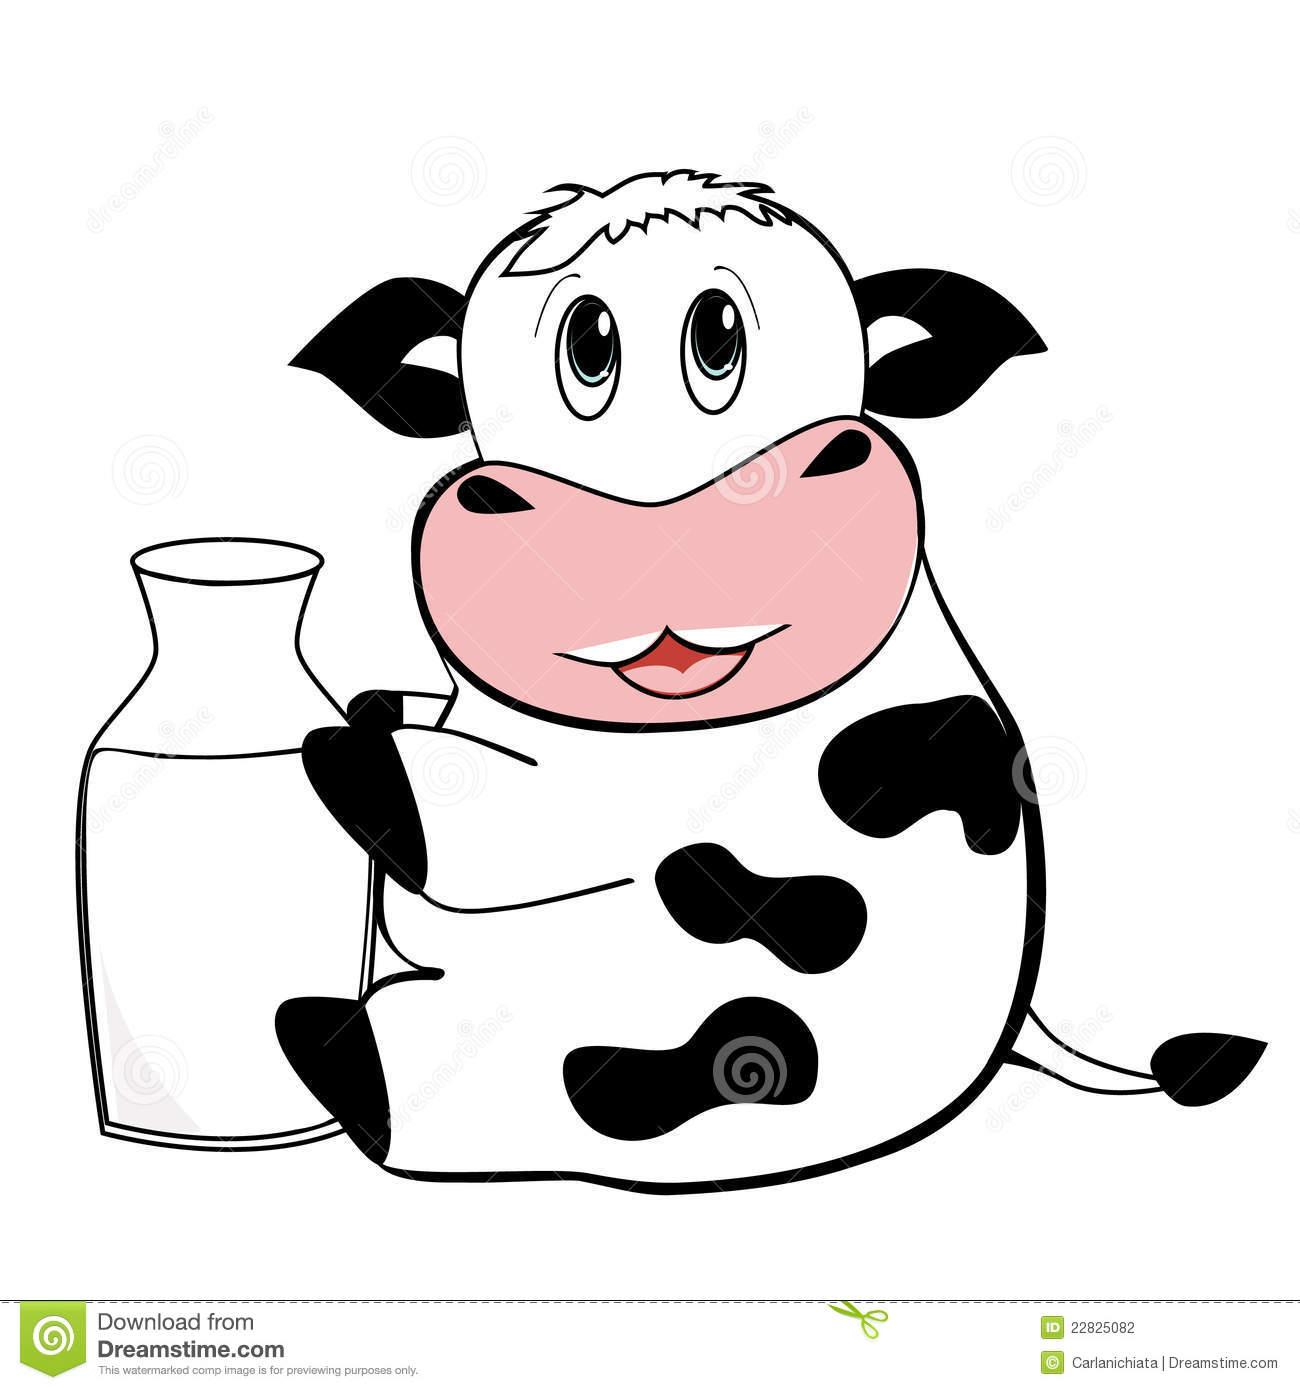 Cow Milk Animation Cute Cow Wallpaper - W...